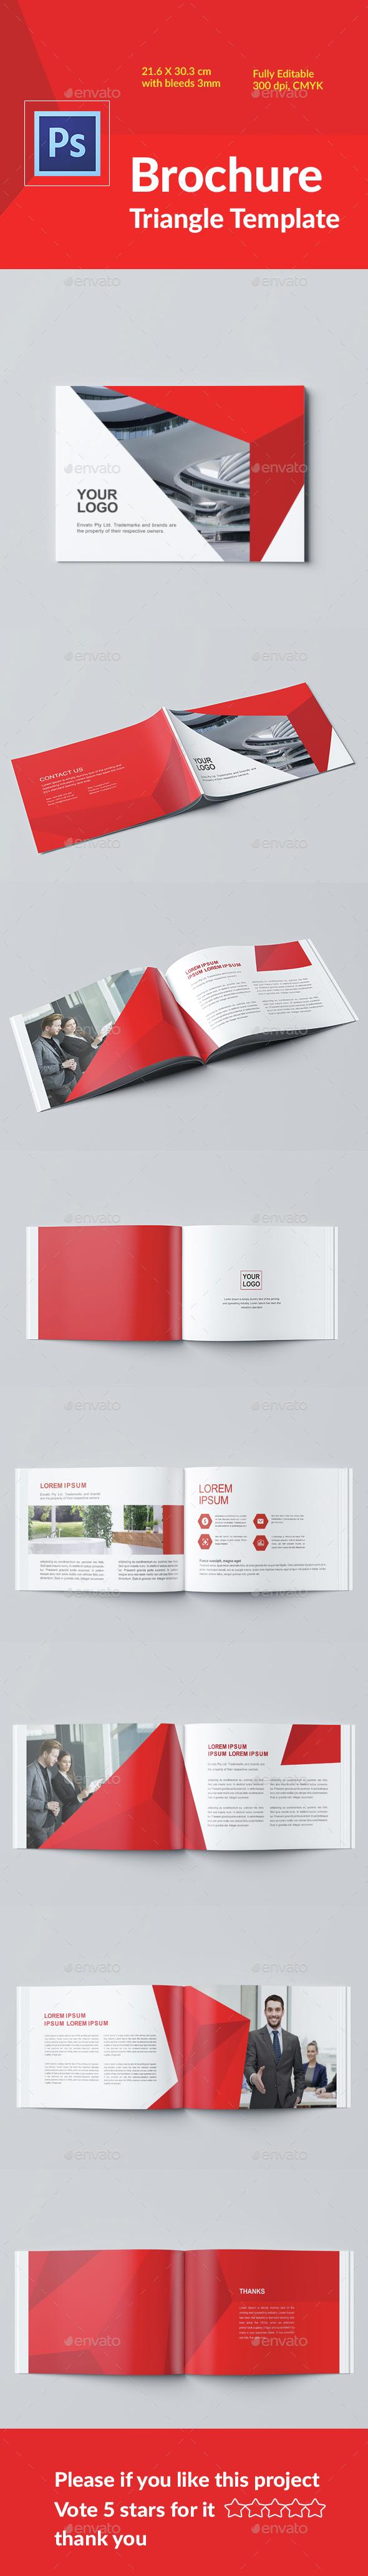 Brochure Template Polygan - Magazines Print Templates